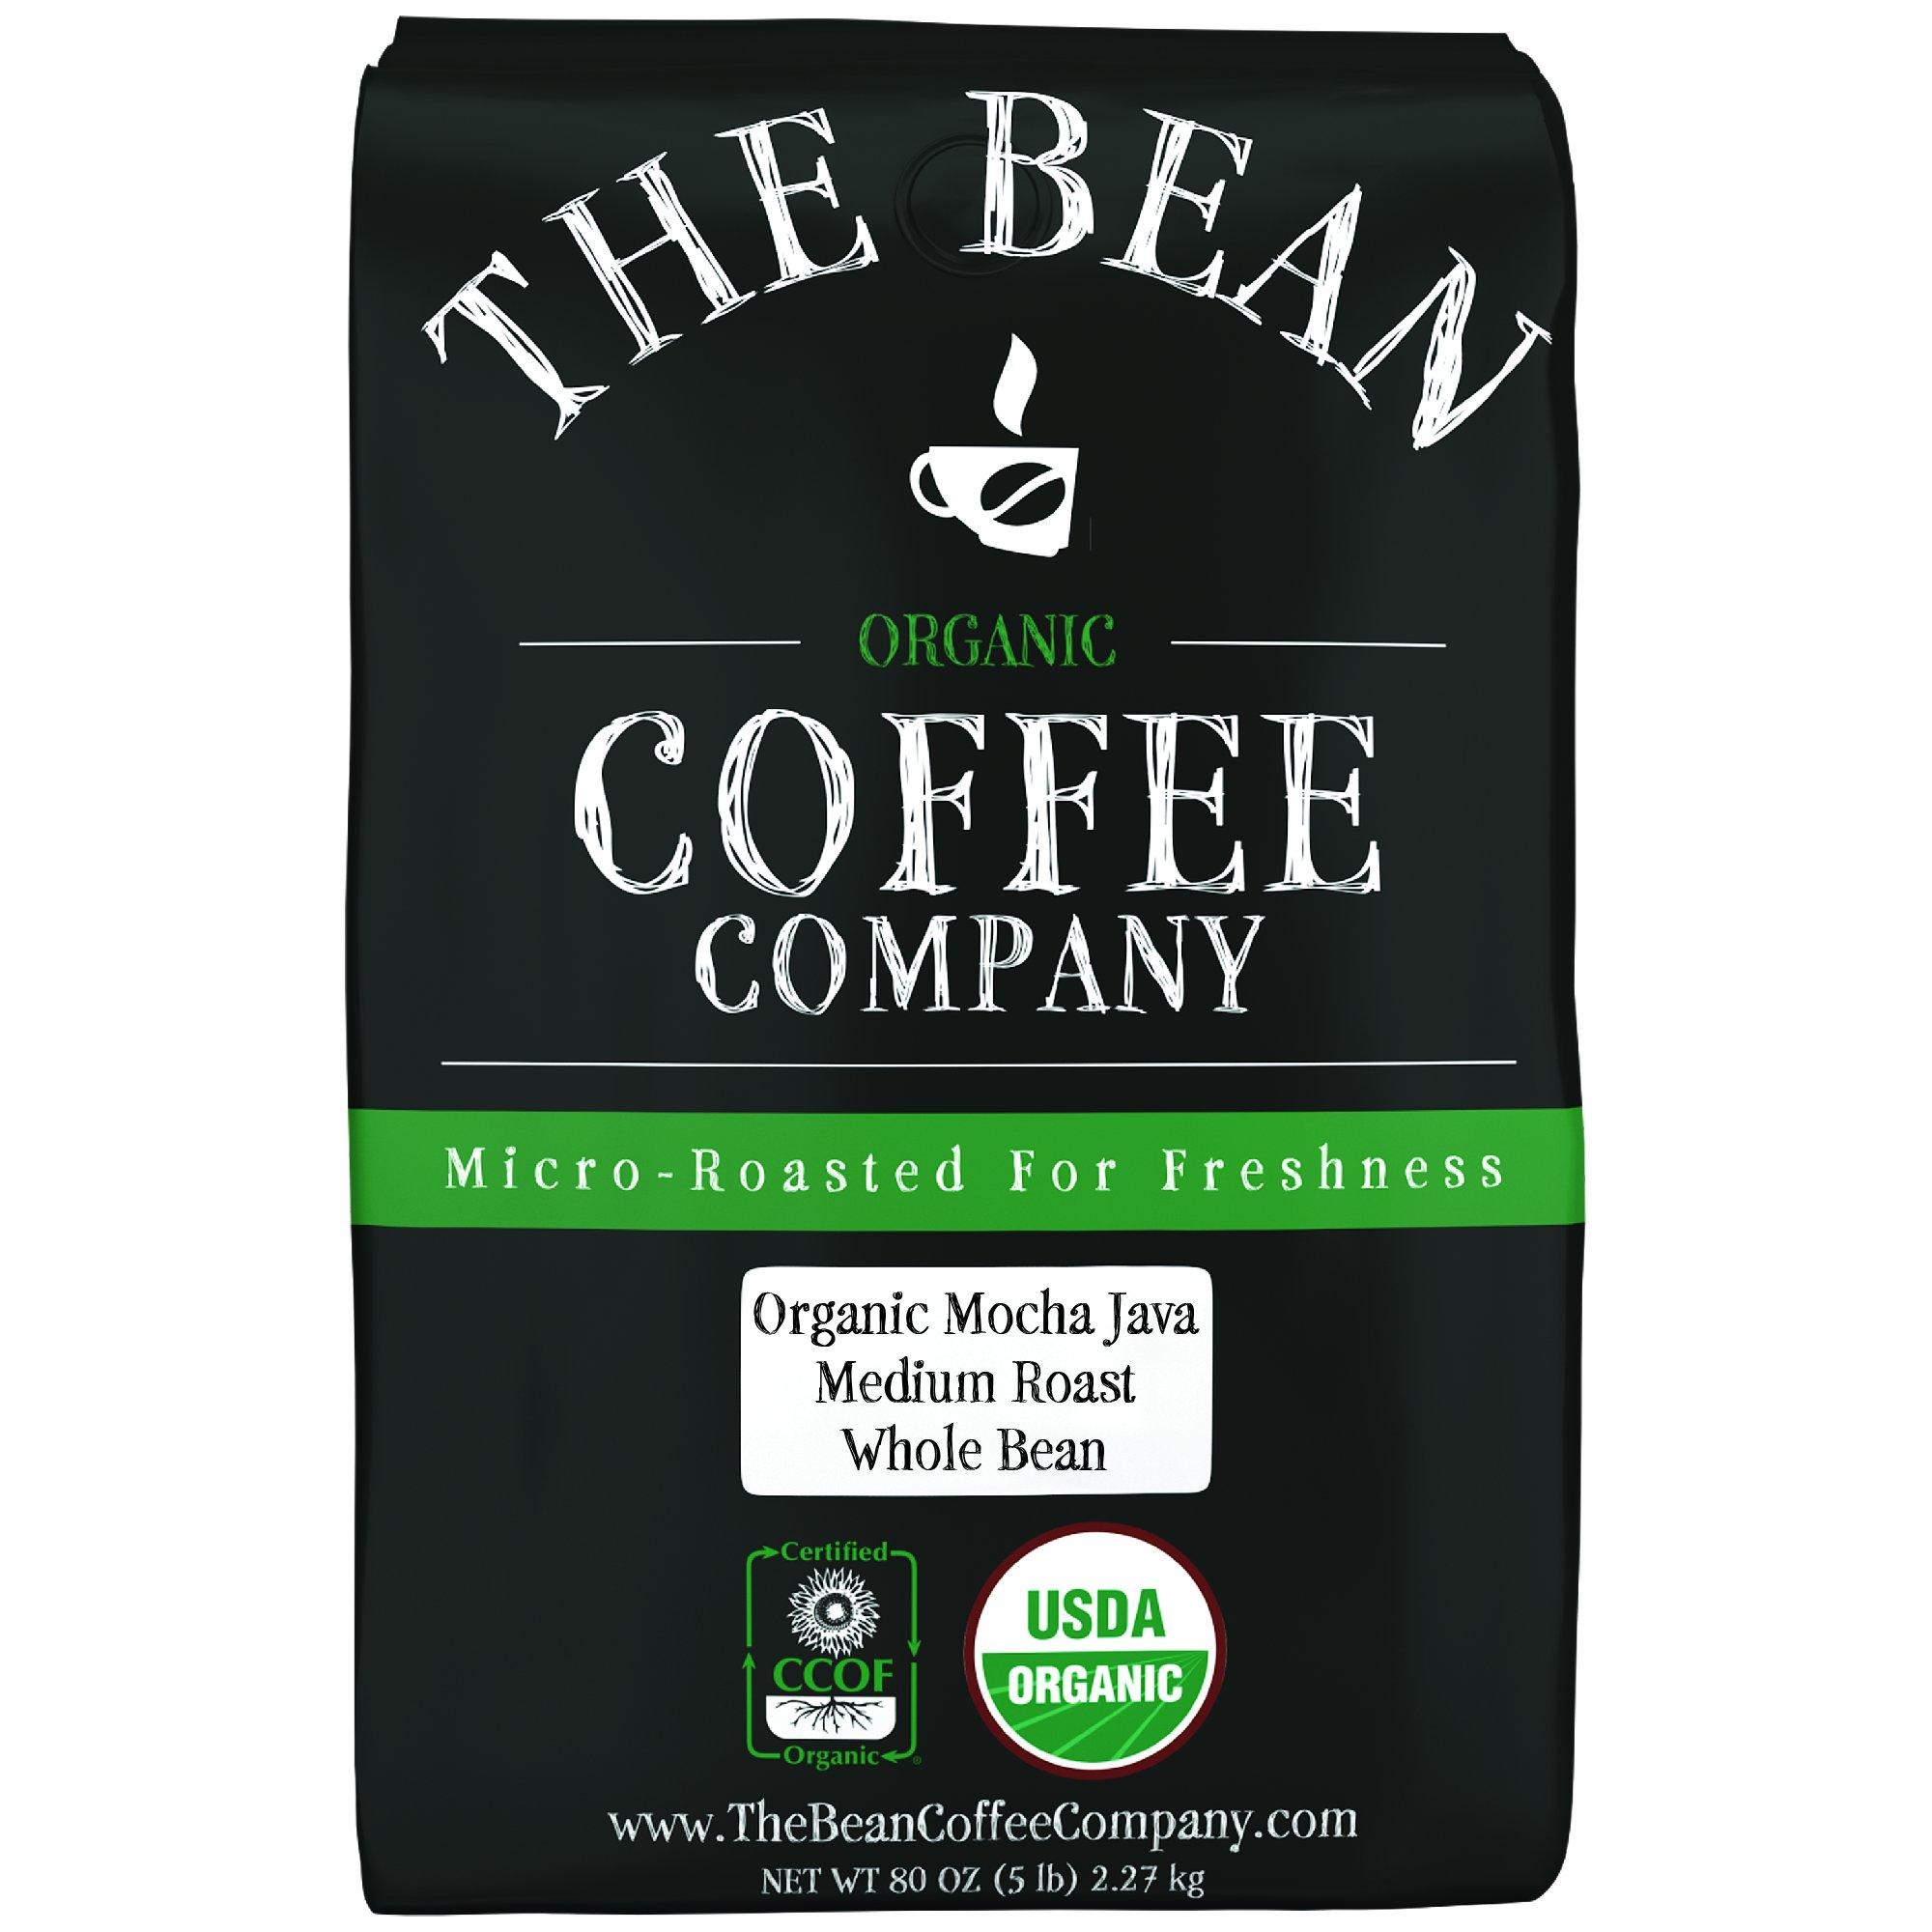 The Bean Coffee Company Organic Mocha Java, Medium Roast, Whole Bean, 5-Pound Bag by The Bean Coffee Company